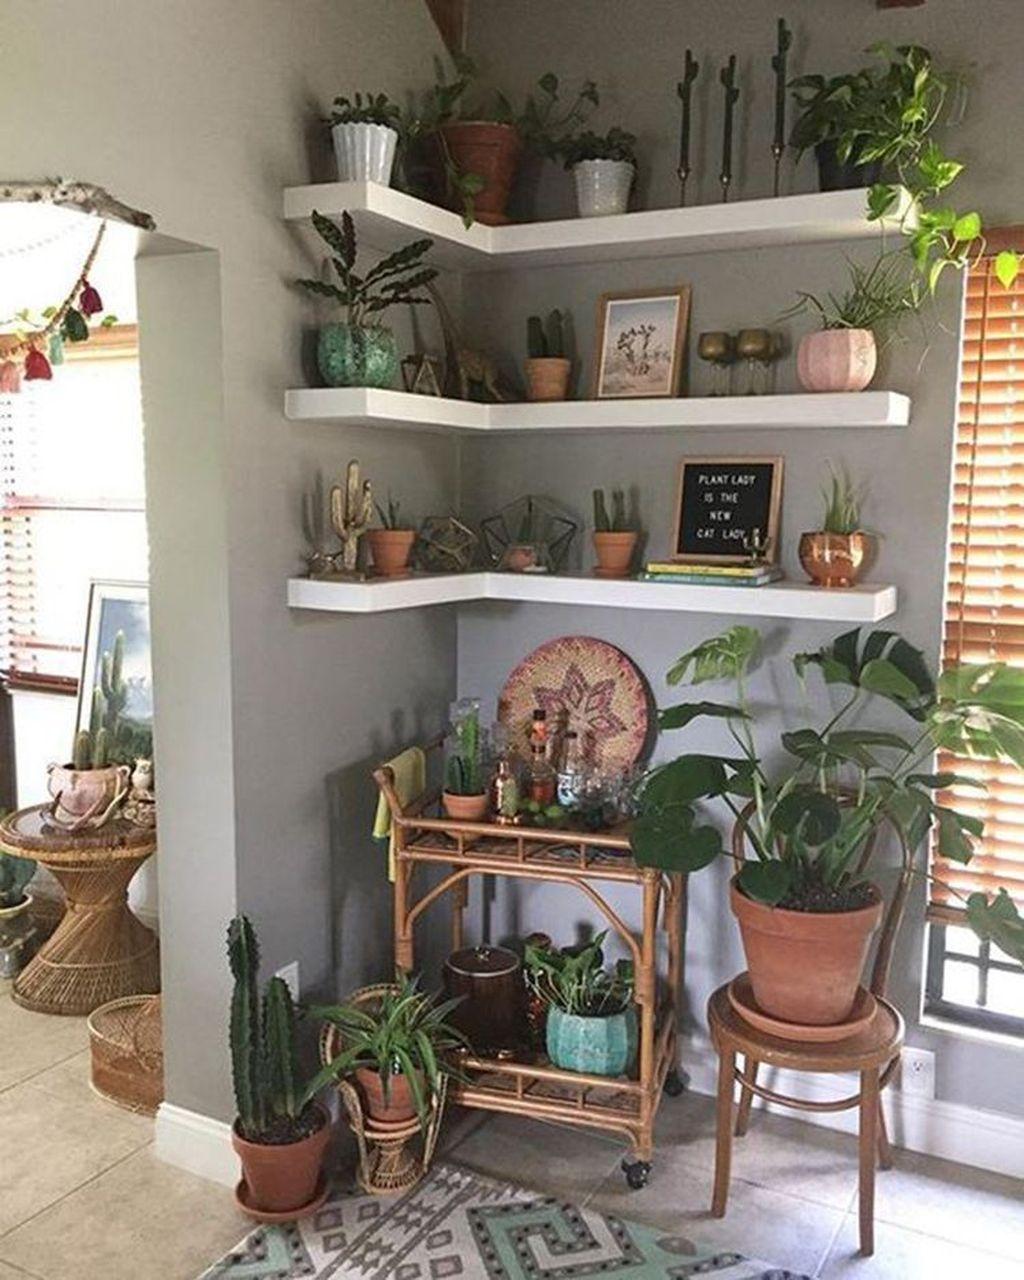 The Best Indoor Garden Ideas To Beautify Your Home 17